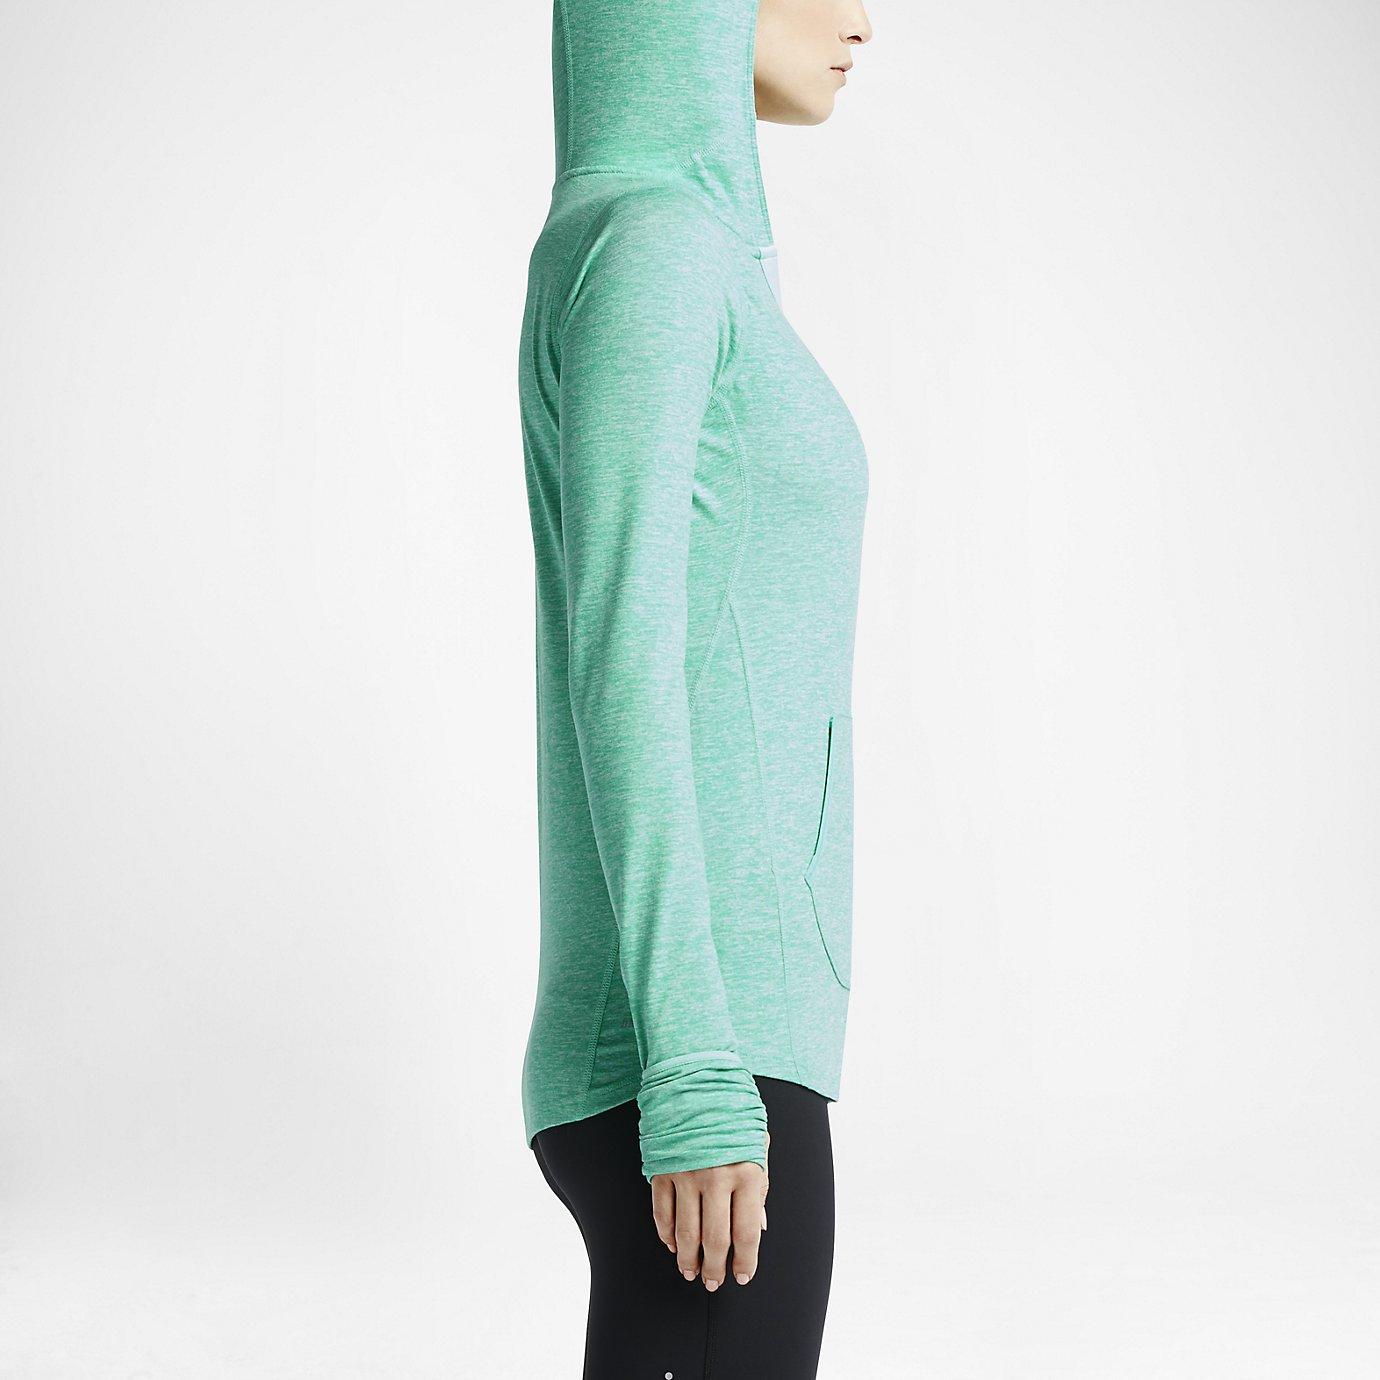 cf2ac1f7625e87 Made with sweat-wicking fabric and flat seams